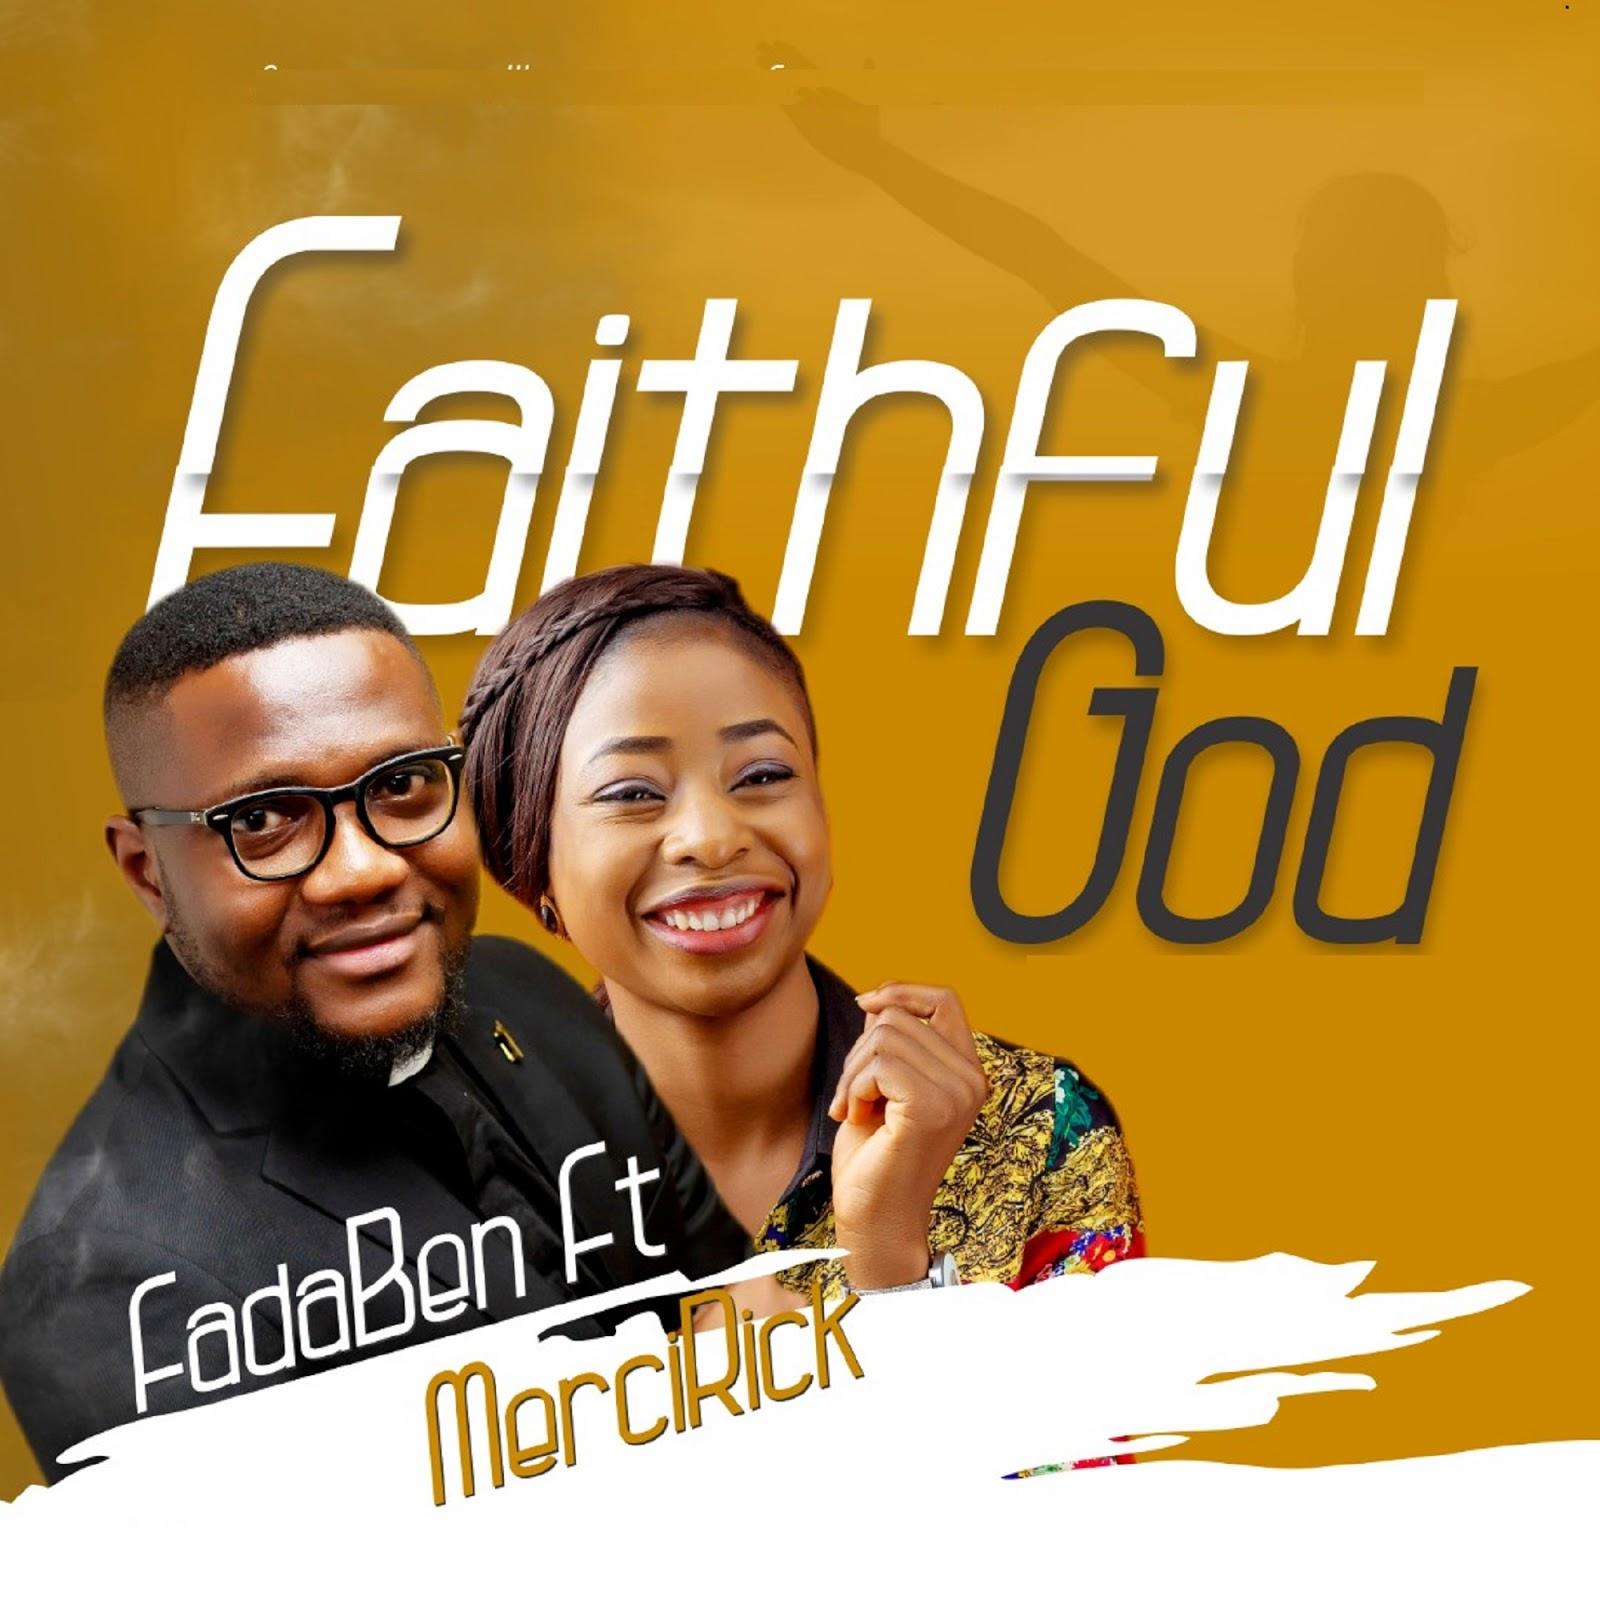 FadaBen - Faithful God Mp3 Download